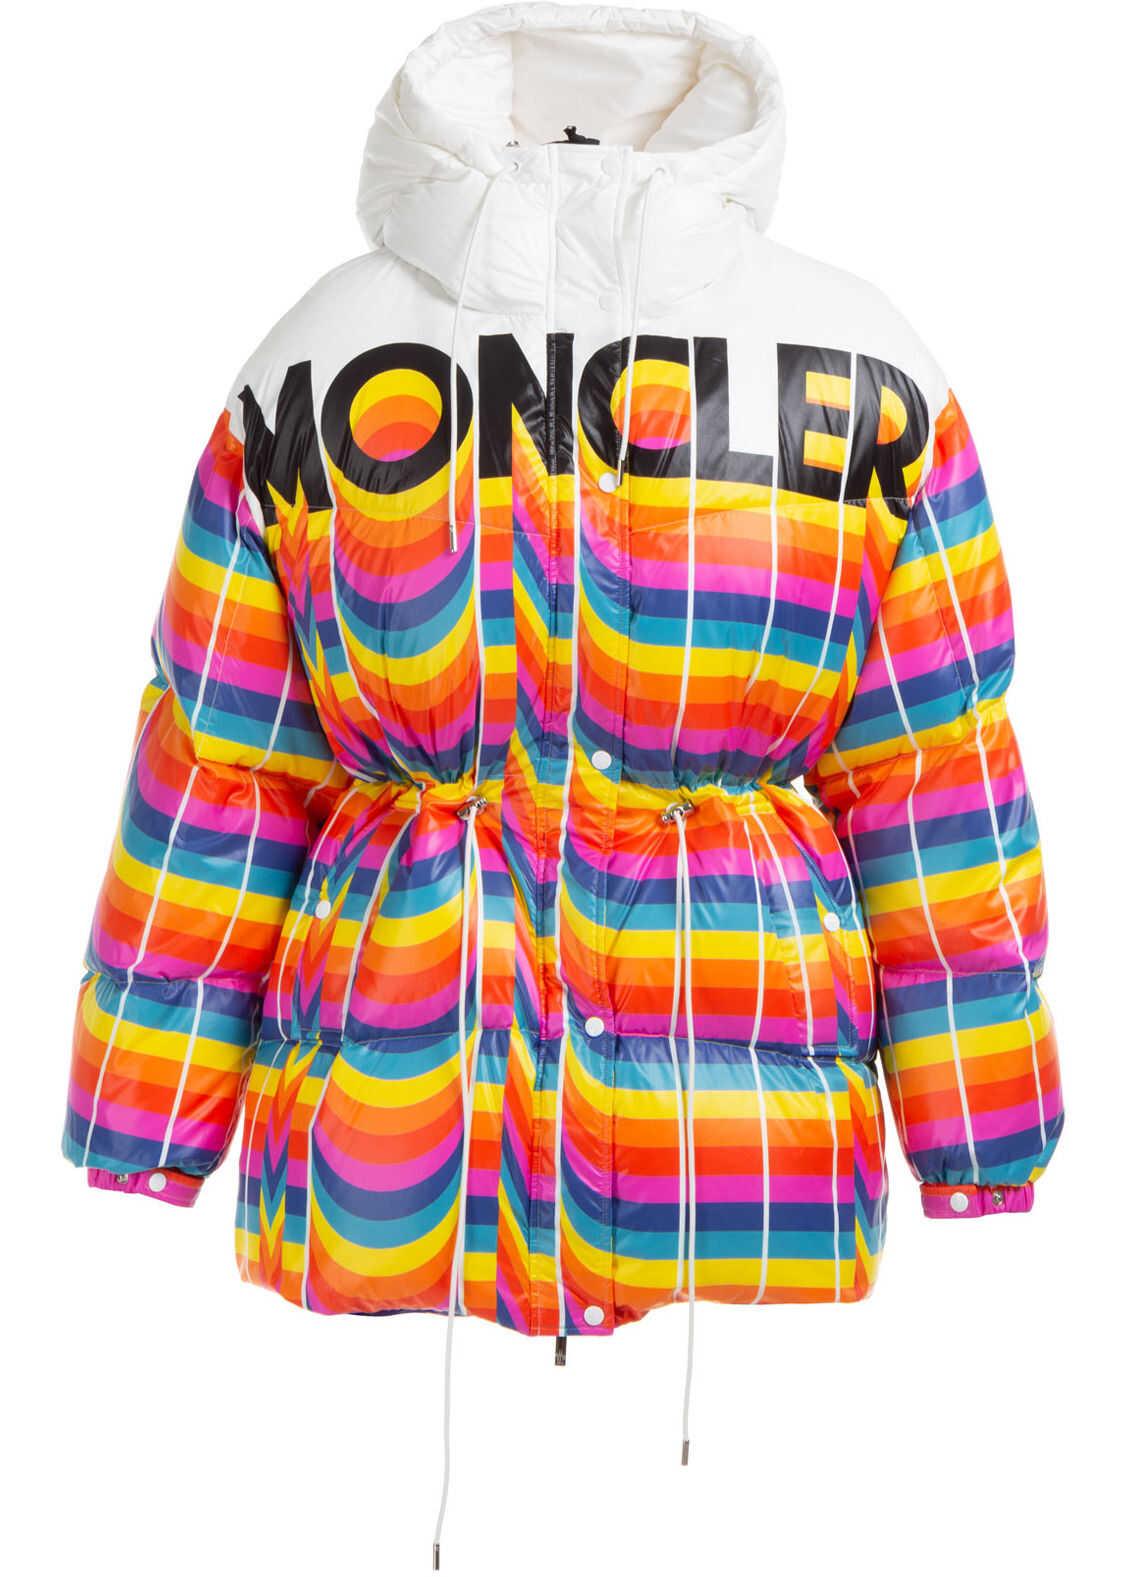 Moncler Genius Blouson Hood White